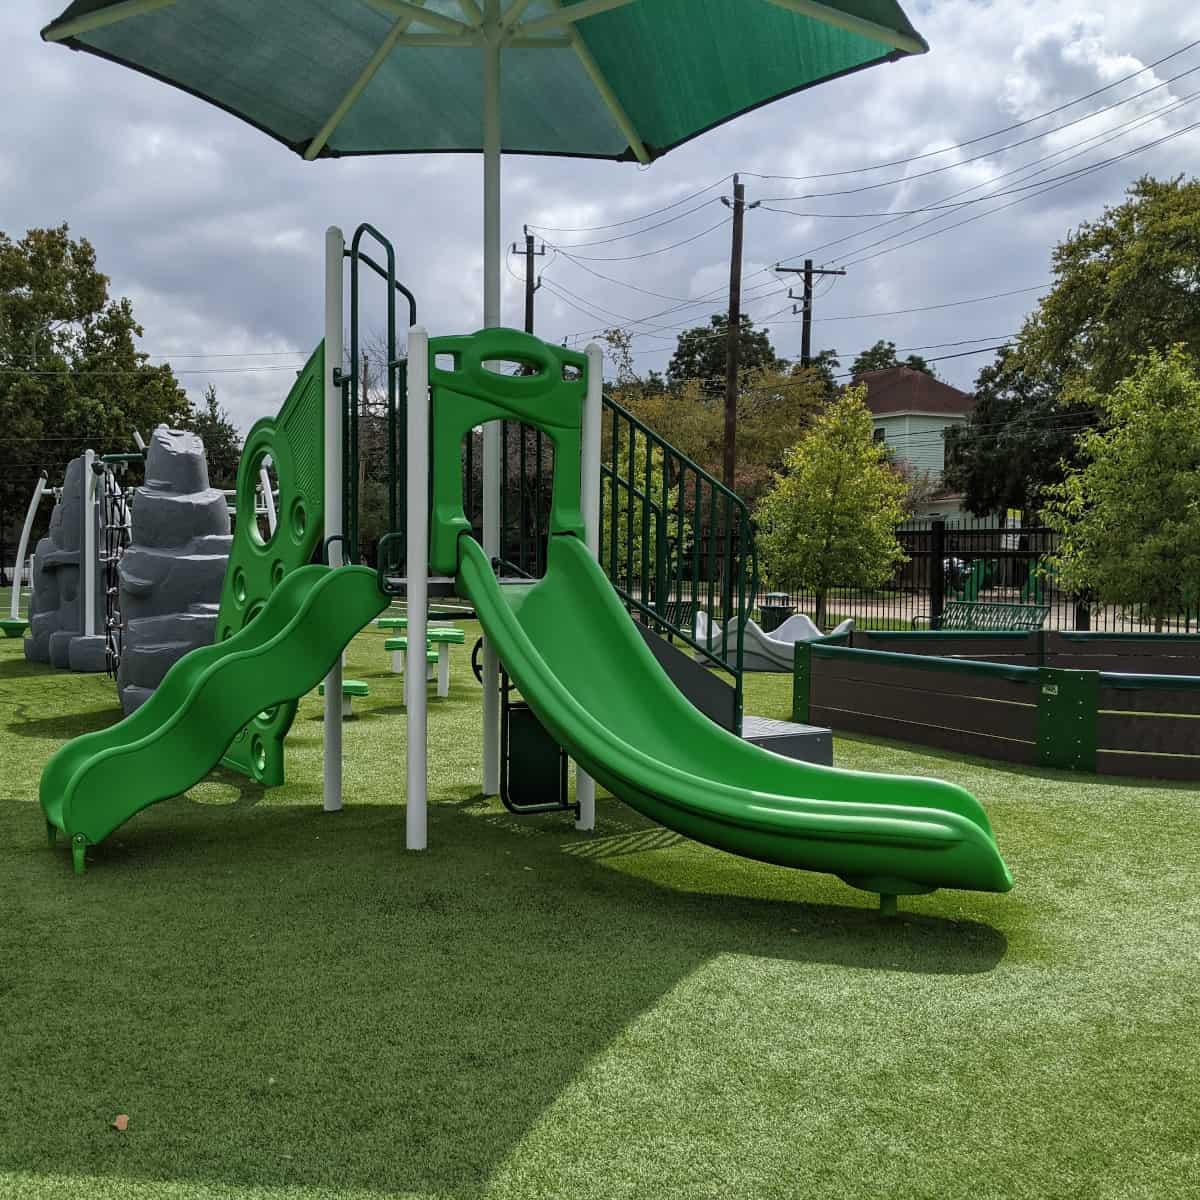 Arabic Immersion School Spark Park Slides